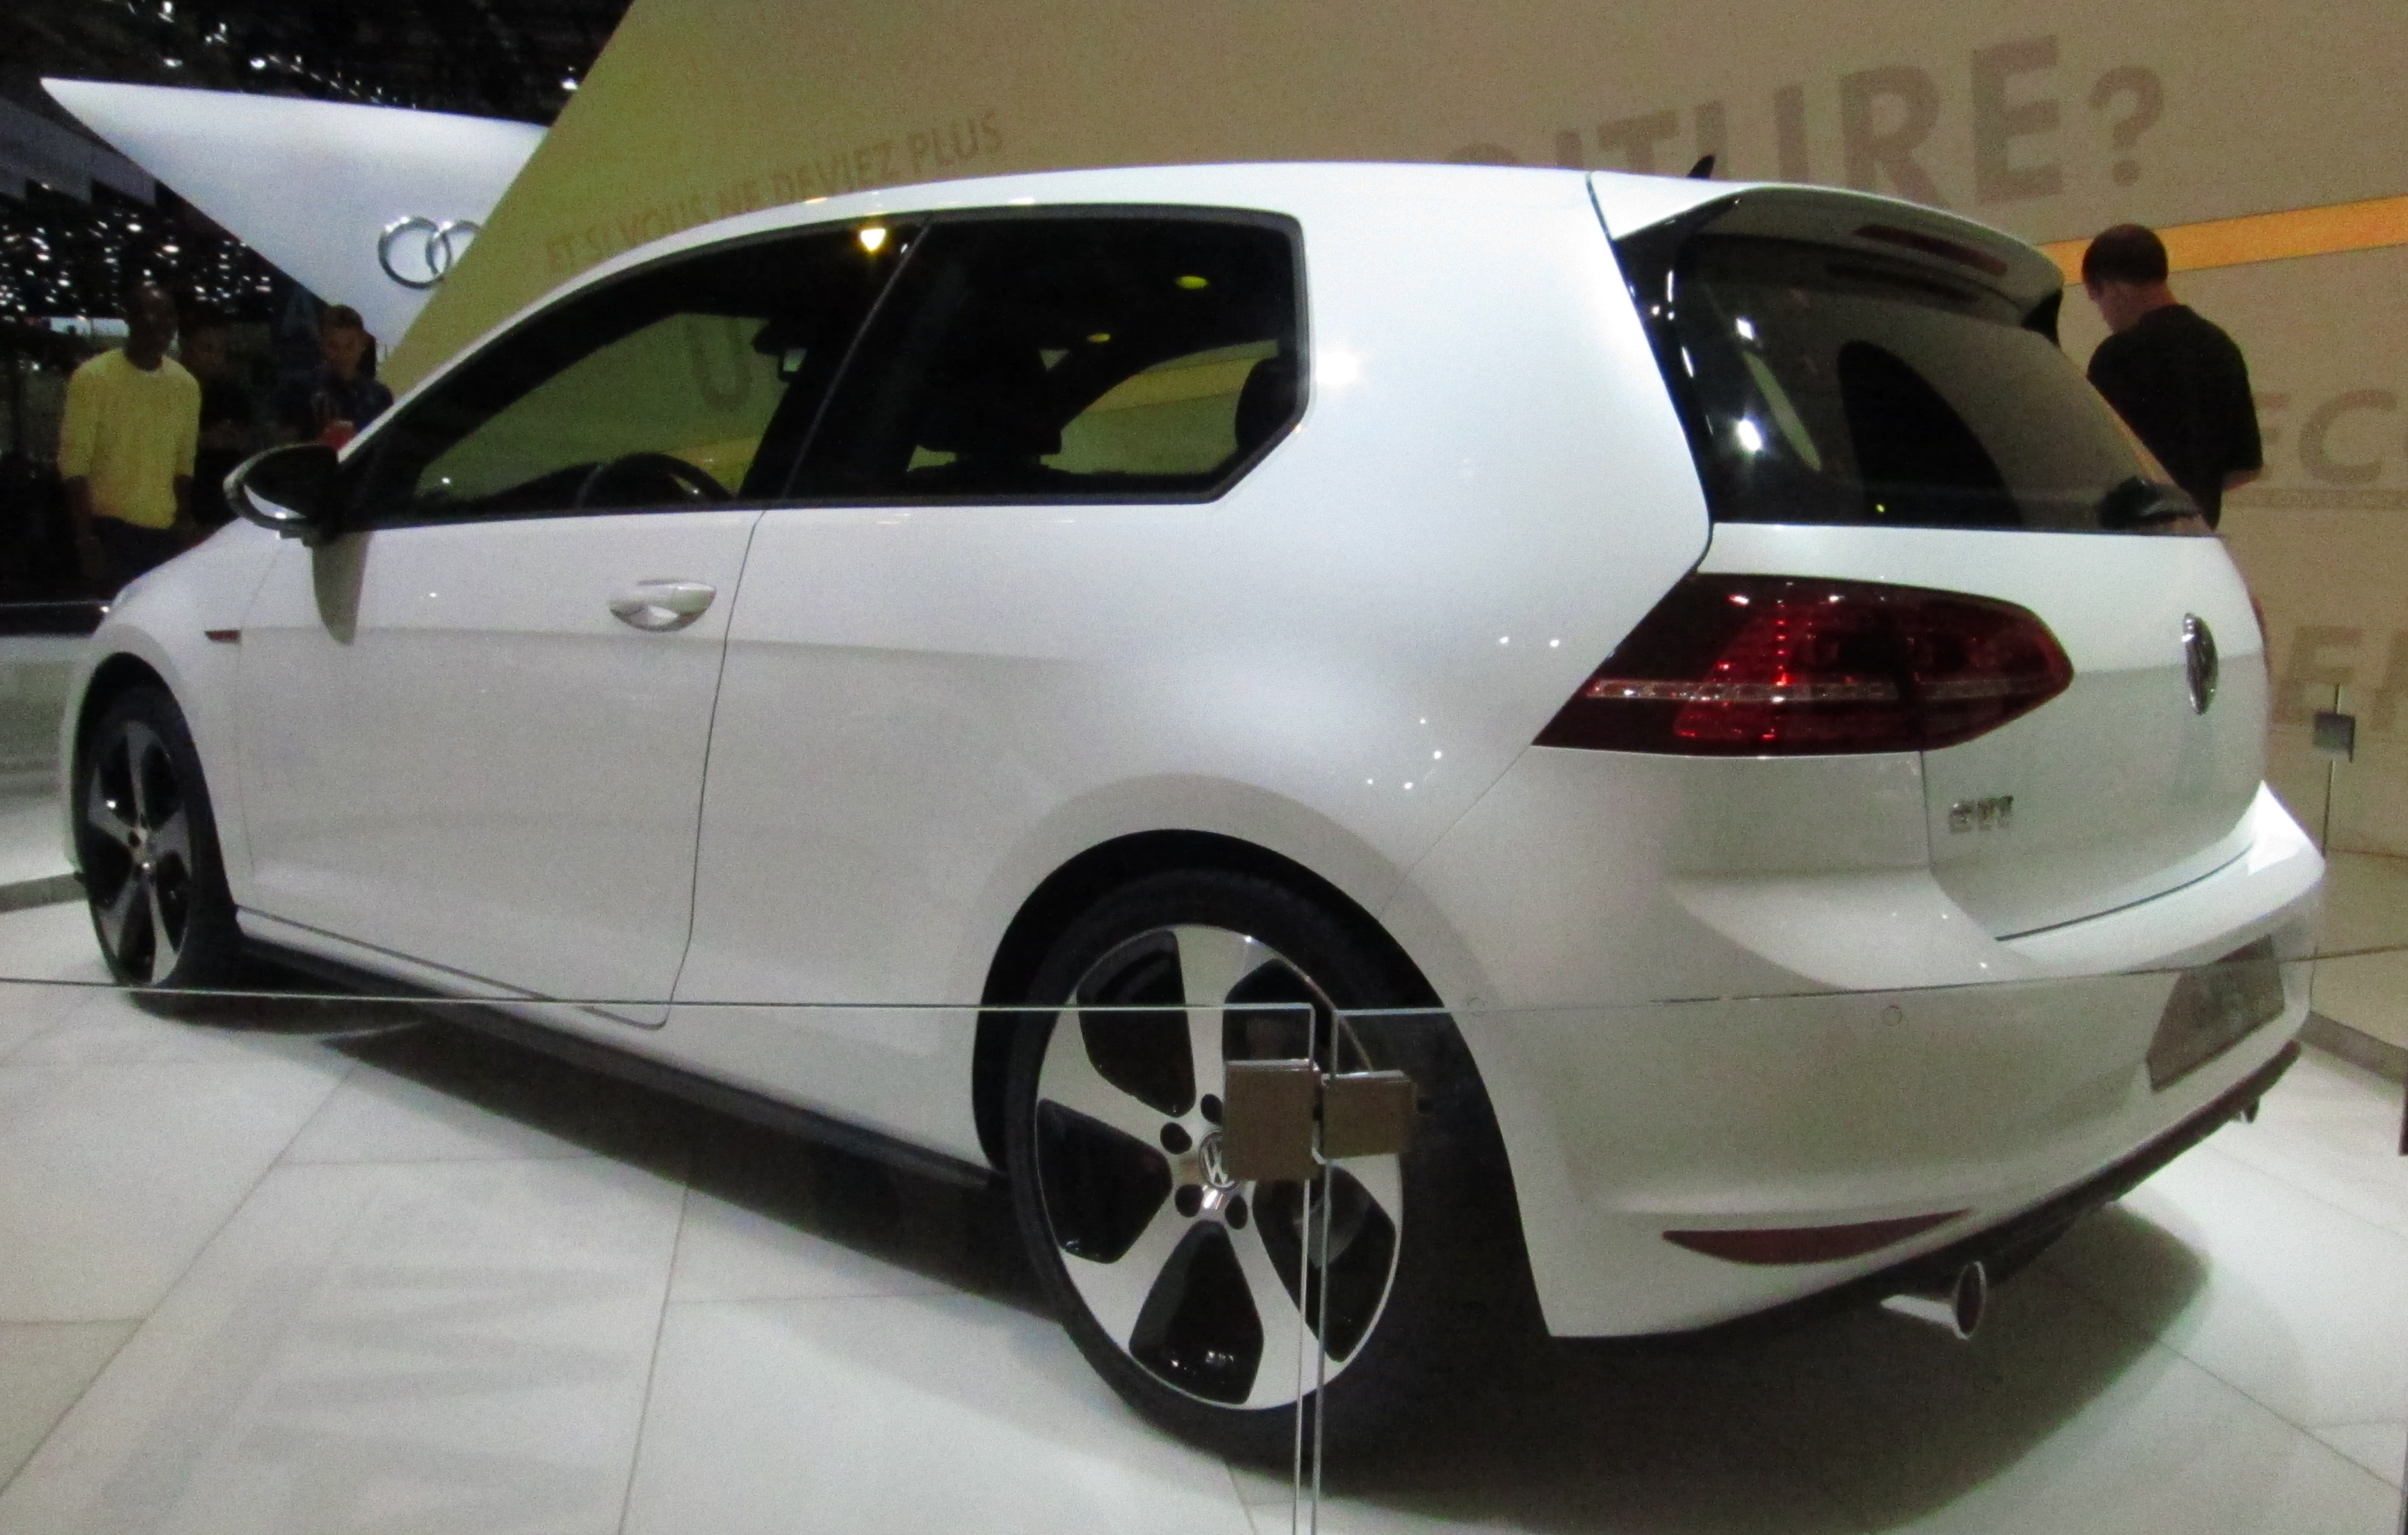 File:Volkswagen Golf VII GTI (rear Quarter) White.JPG